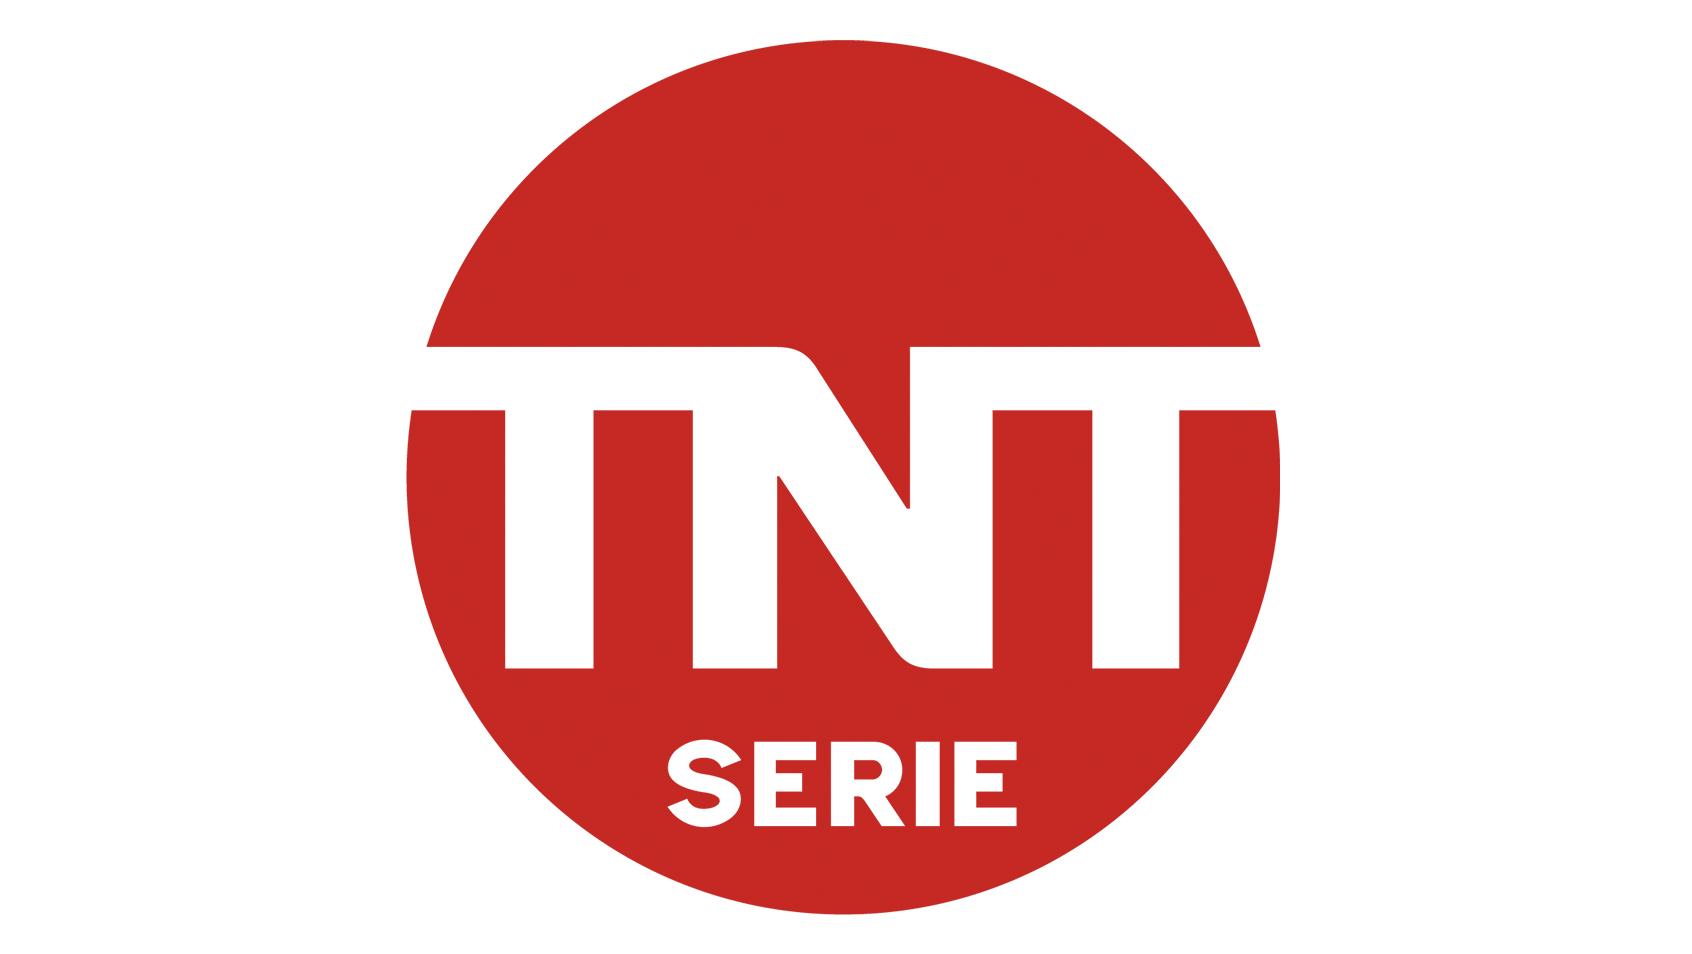 TNT Serie - Logo - Claim